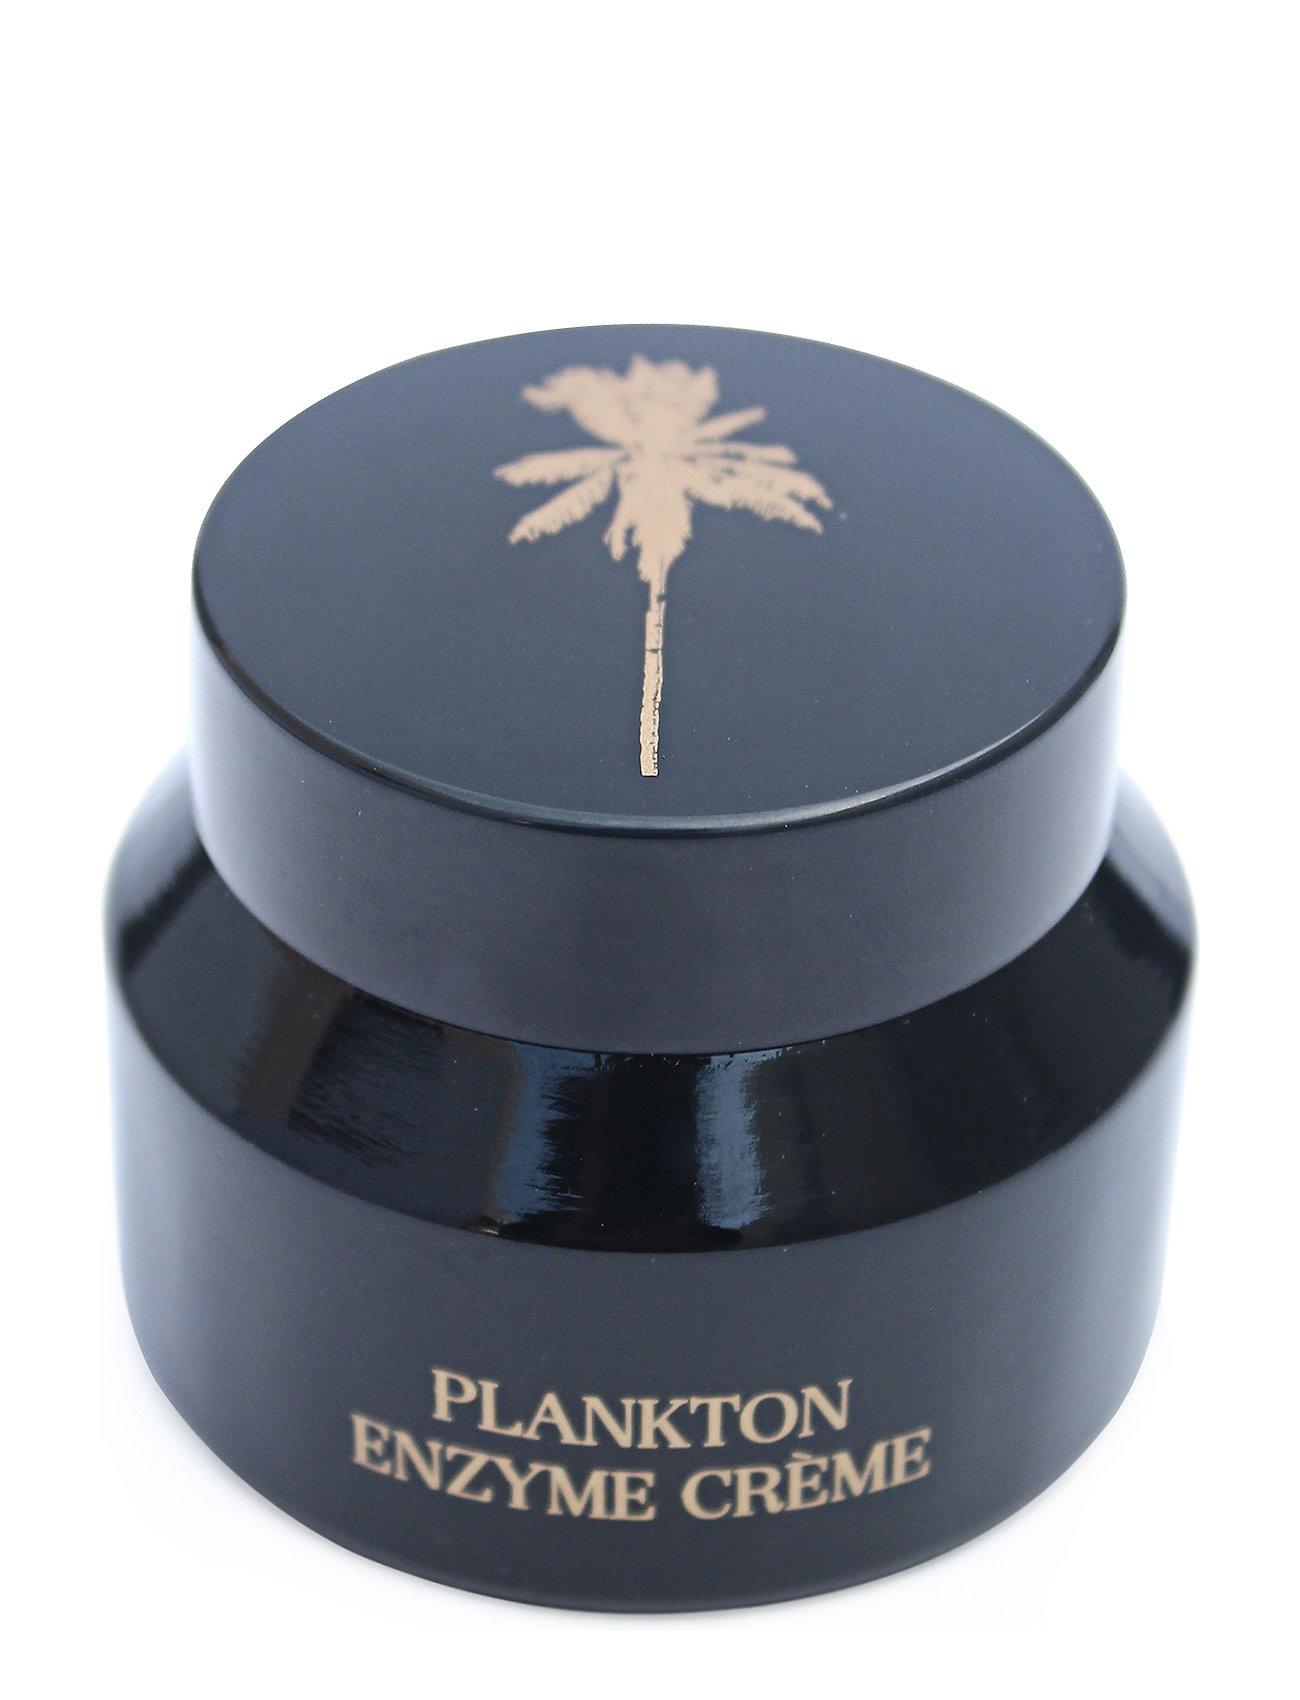 raaw in a jar – Plankton enzyme creme fra boozt.com dk